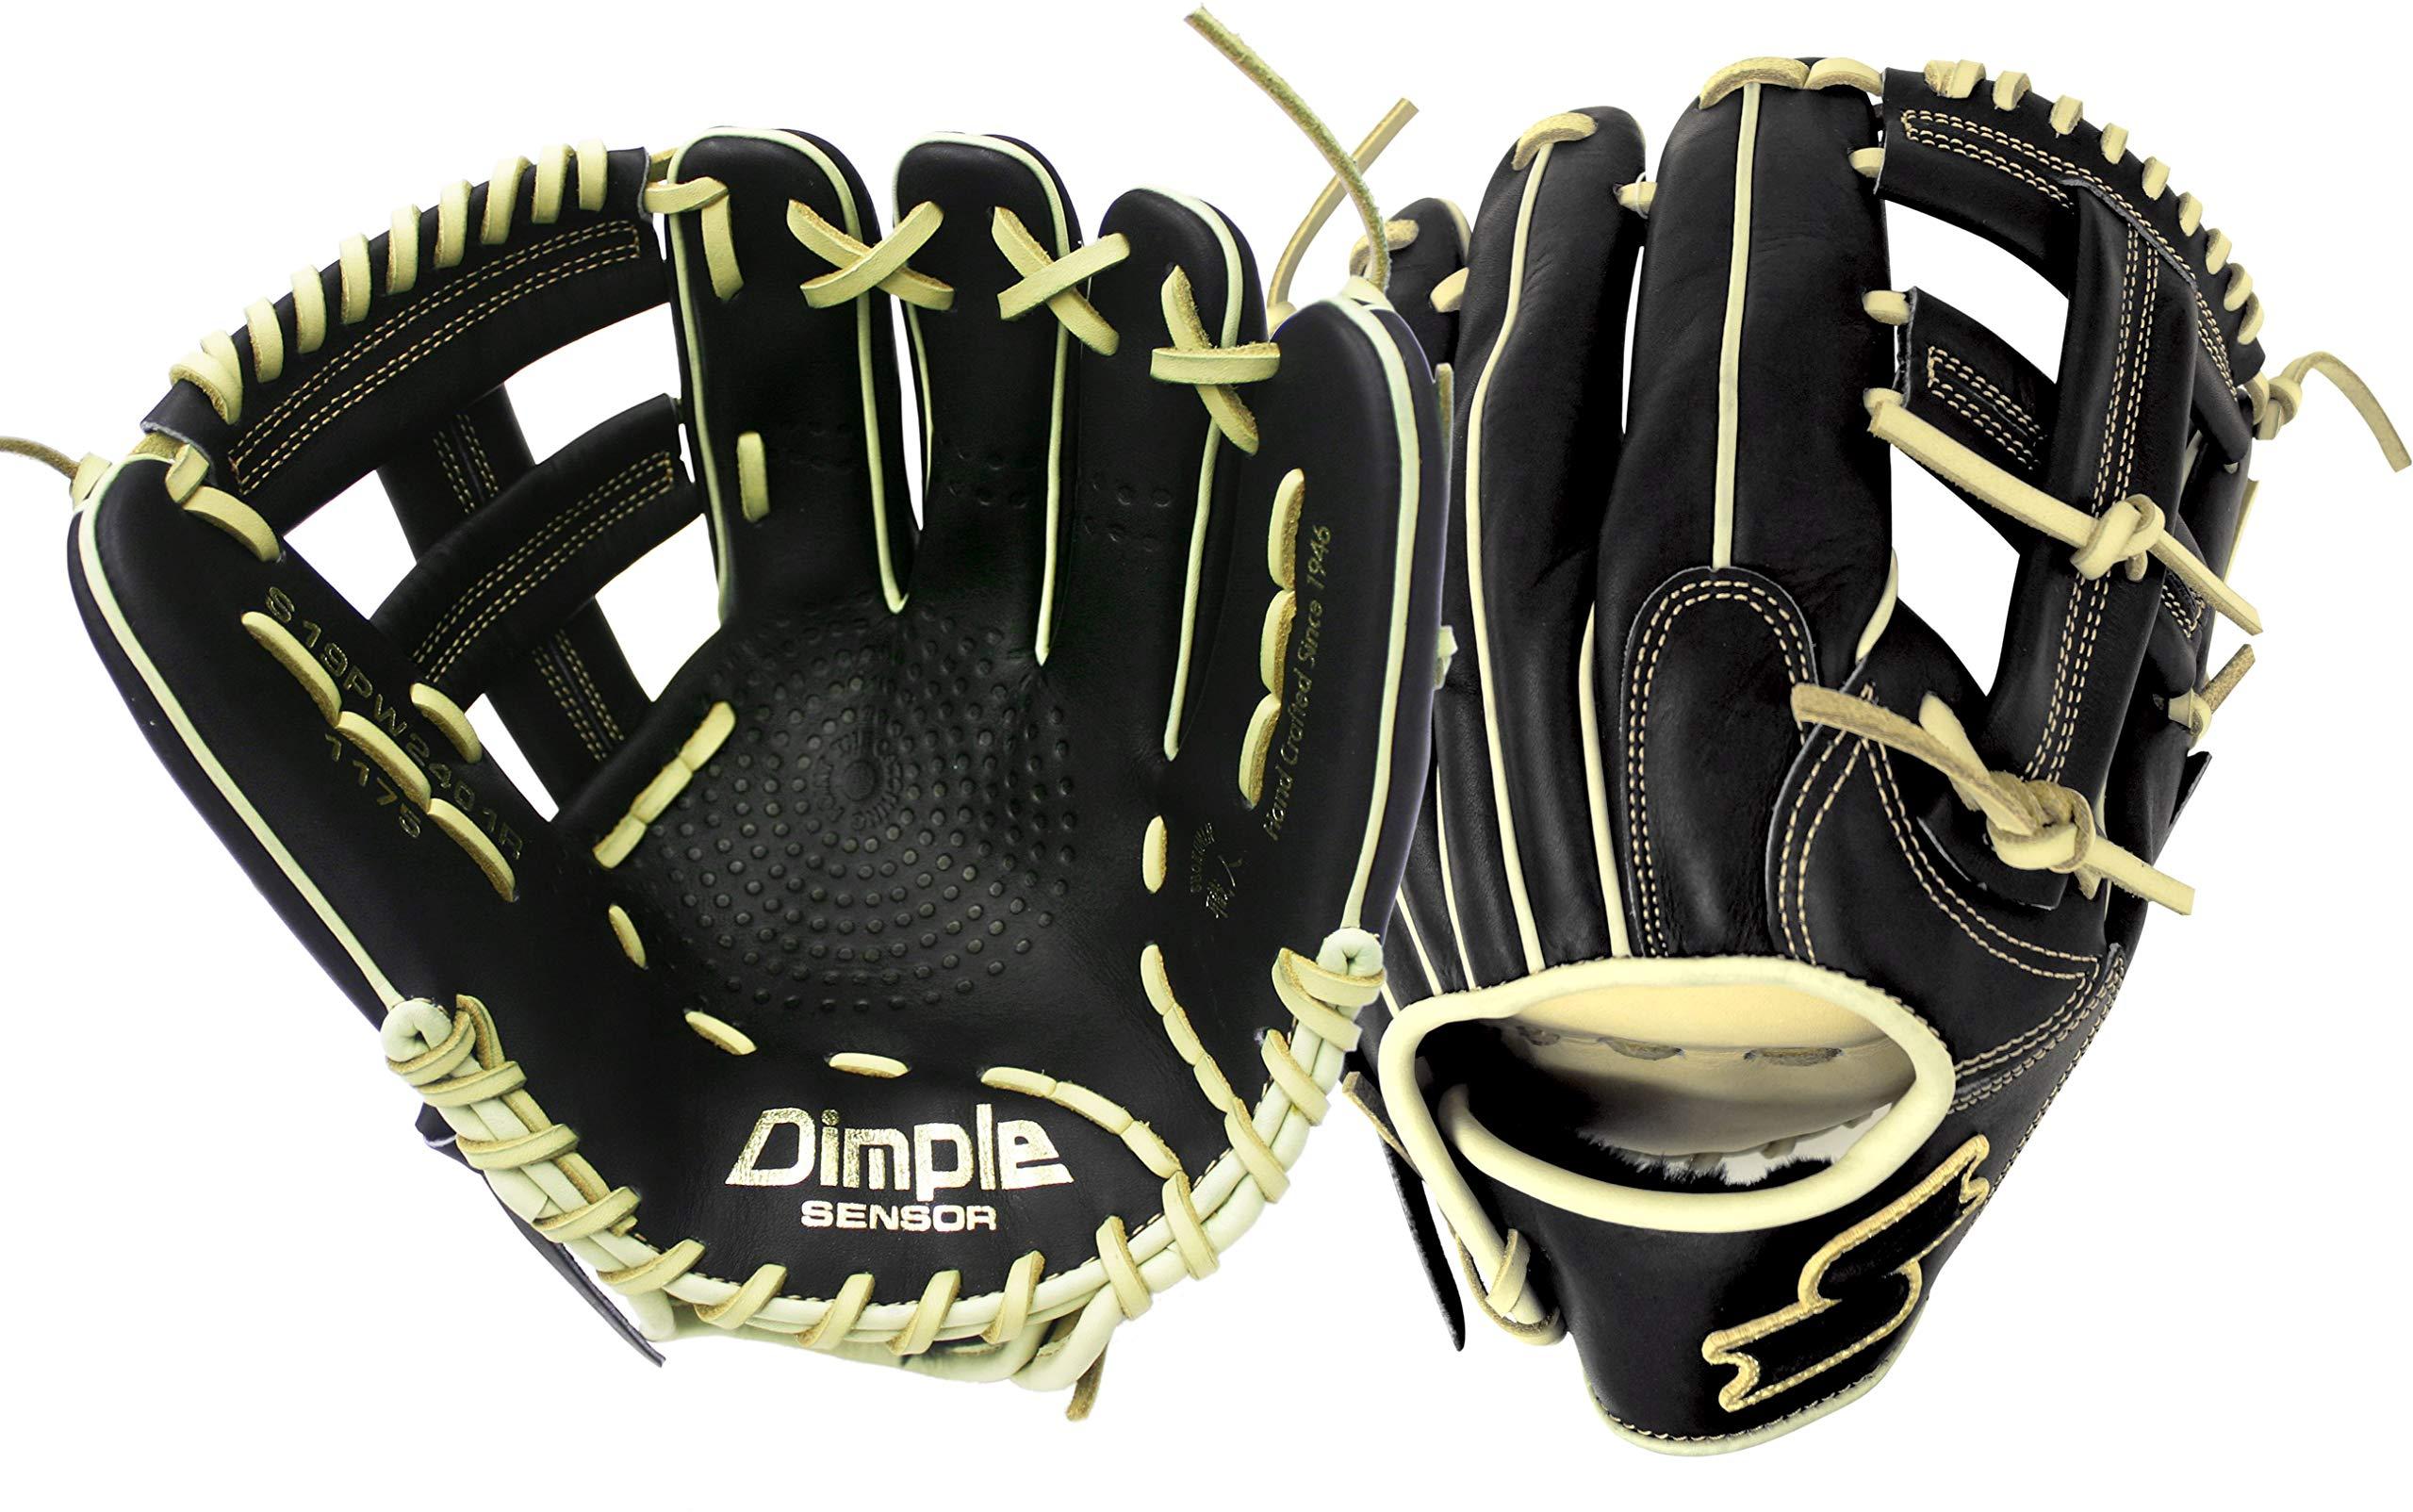 SSK Black Line Series 11.75'' Baseball Glove